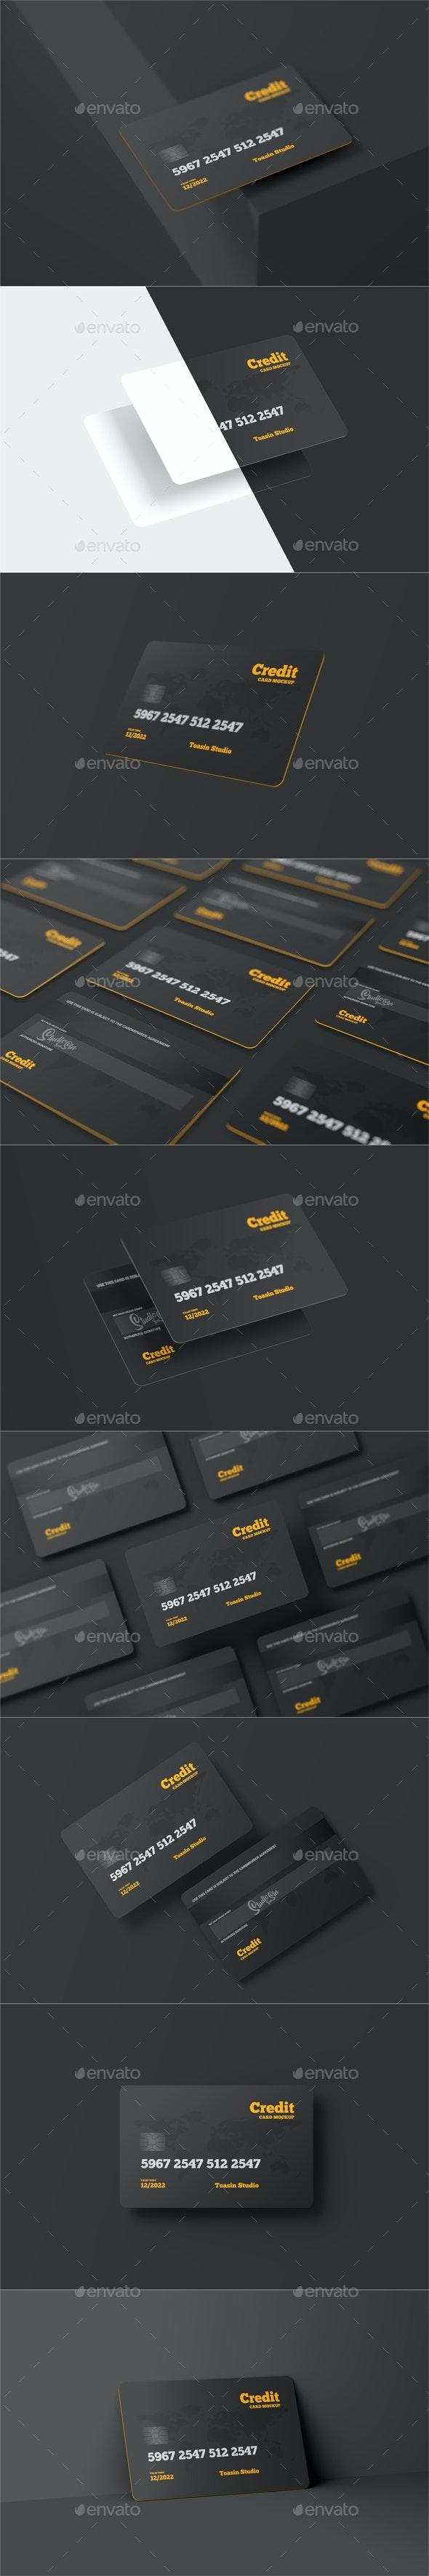 Credit Cards / Gift Cards Mockup - Print Product Mock-Ups